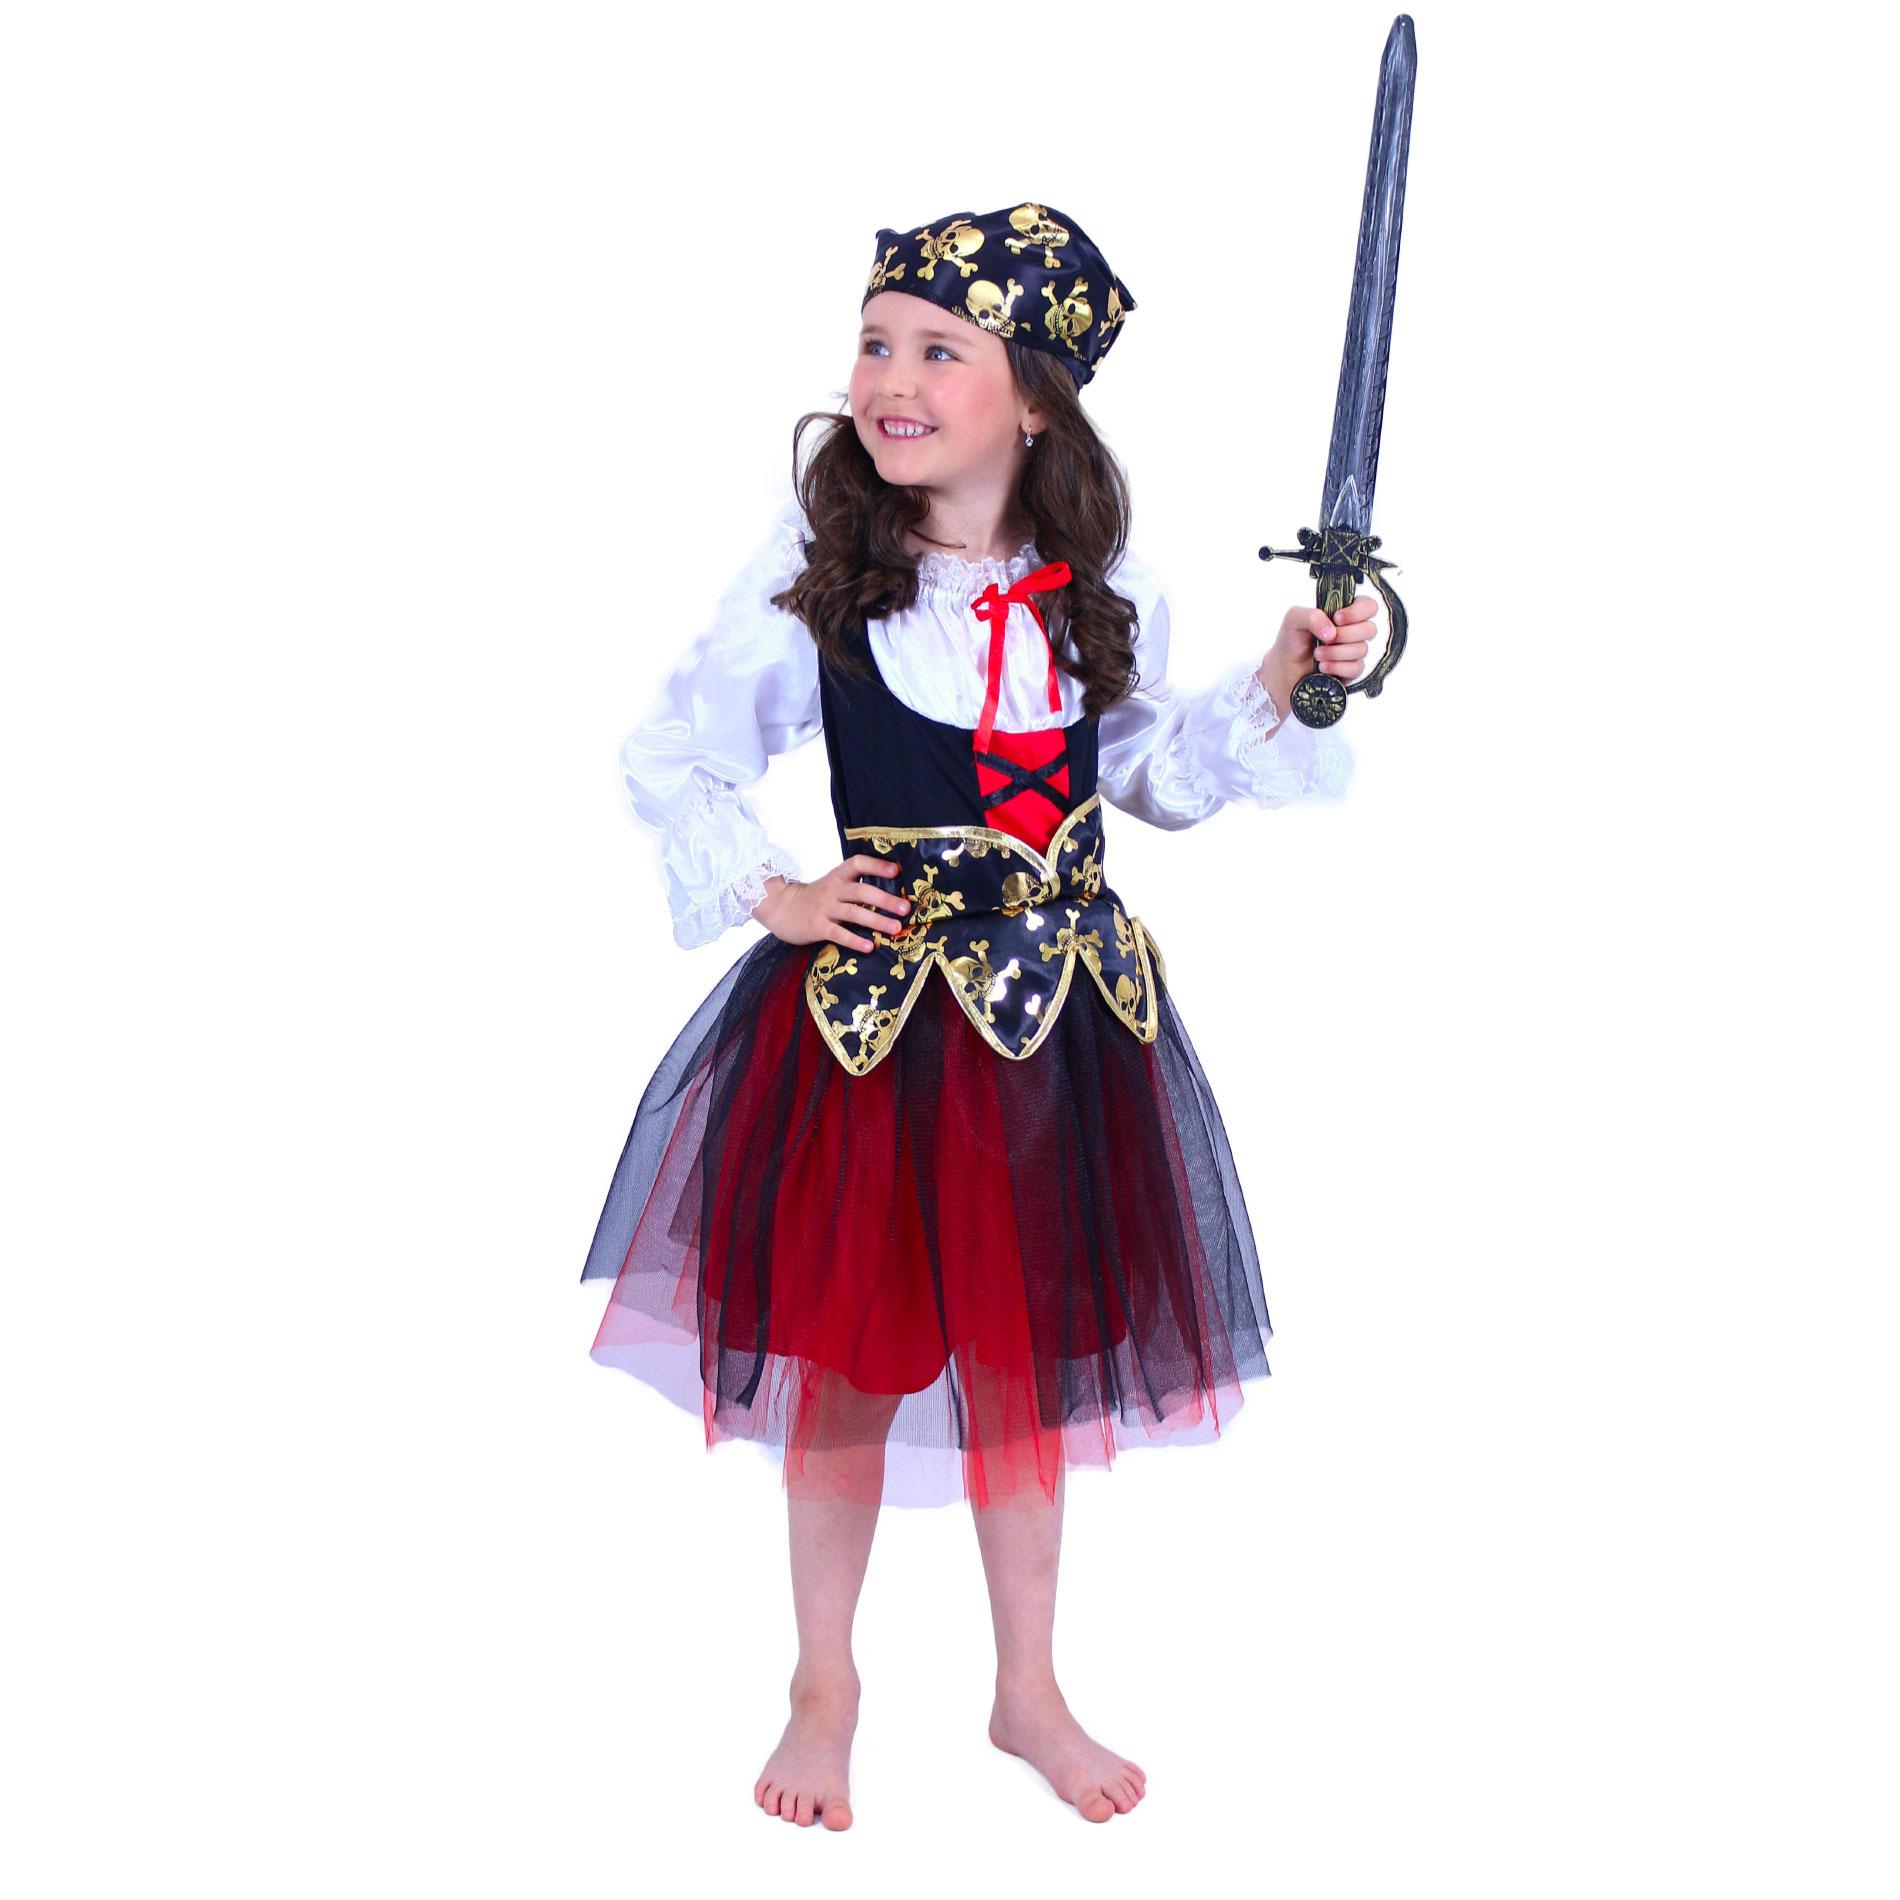 Dětský kostým pirátka (S) e-obal